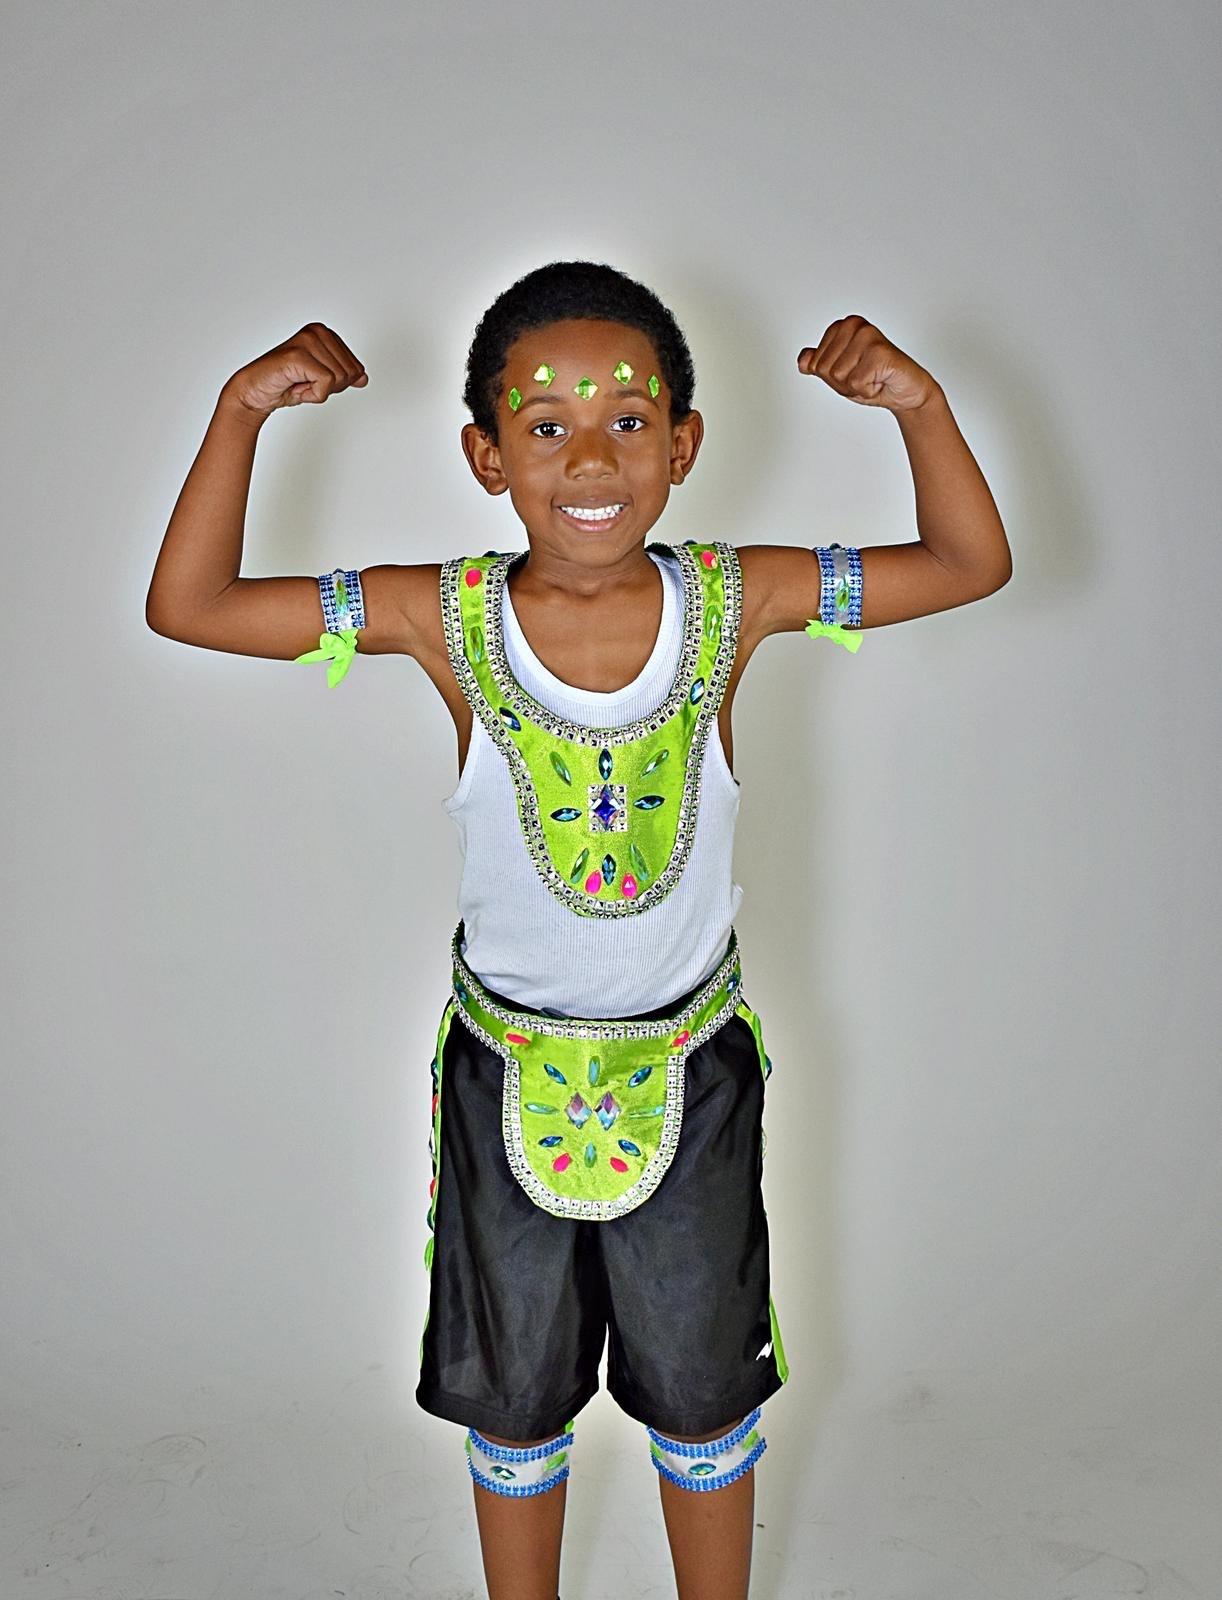 Boys' Costume